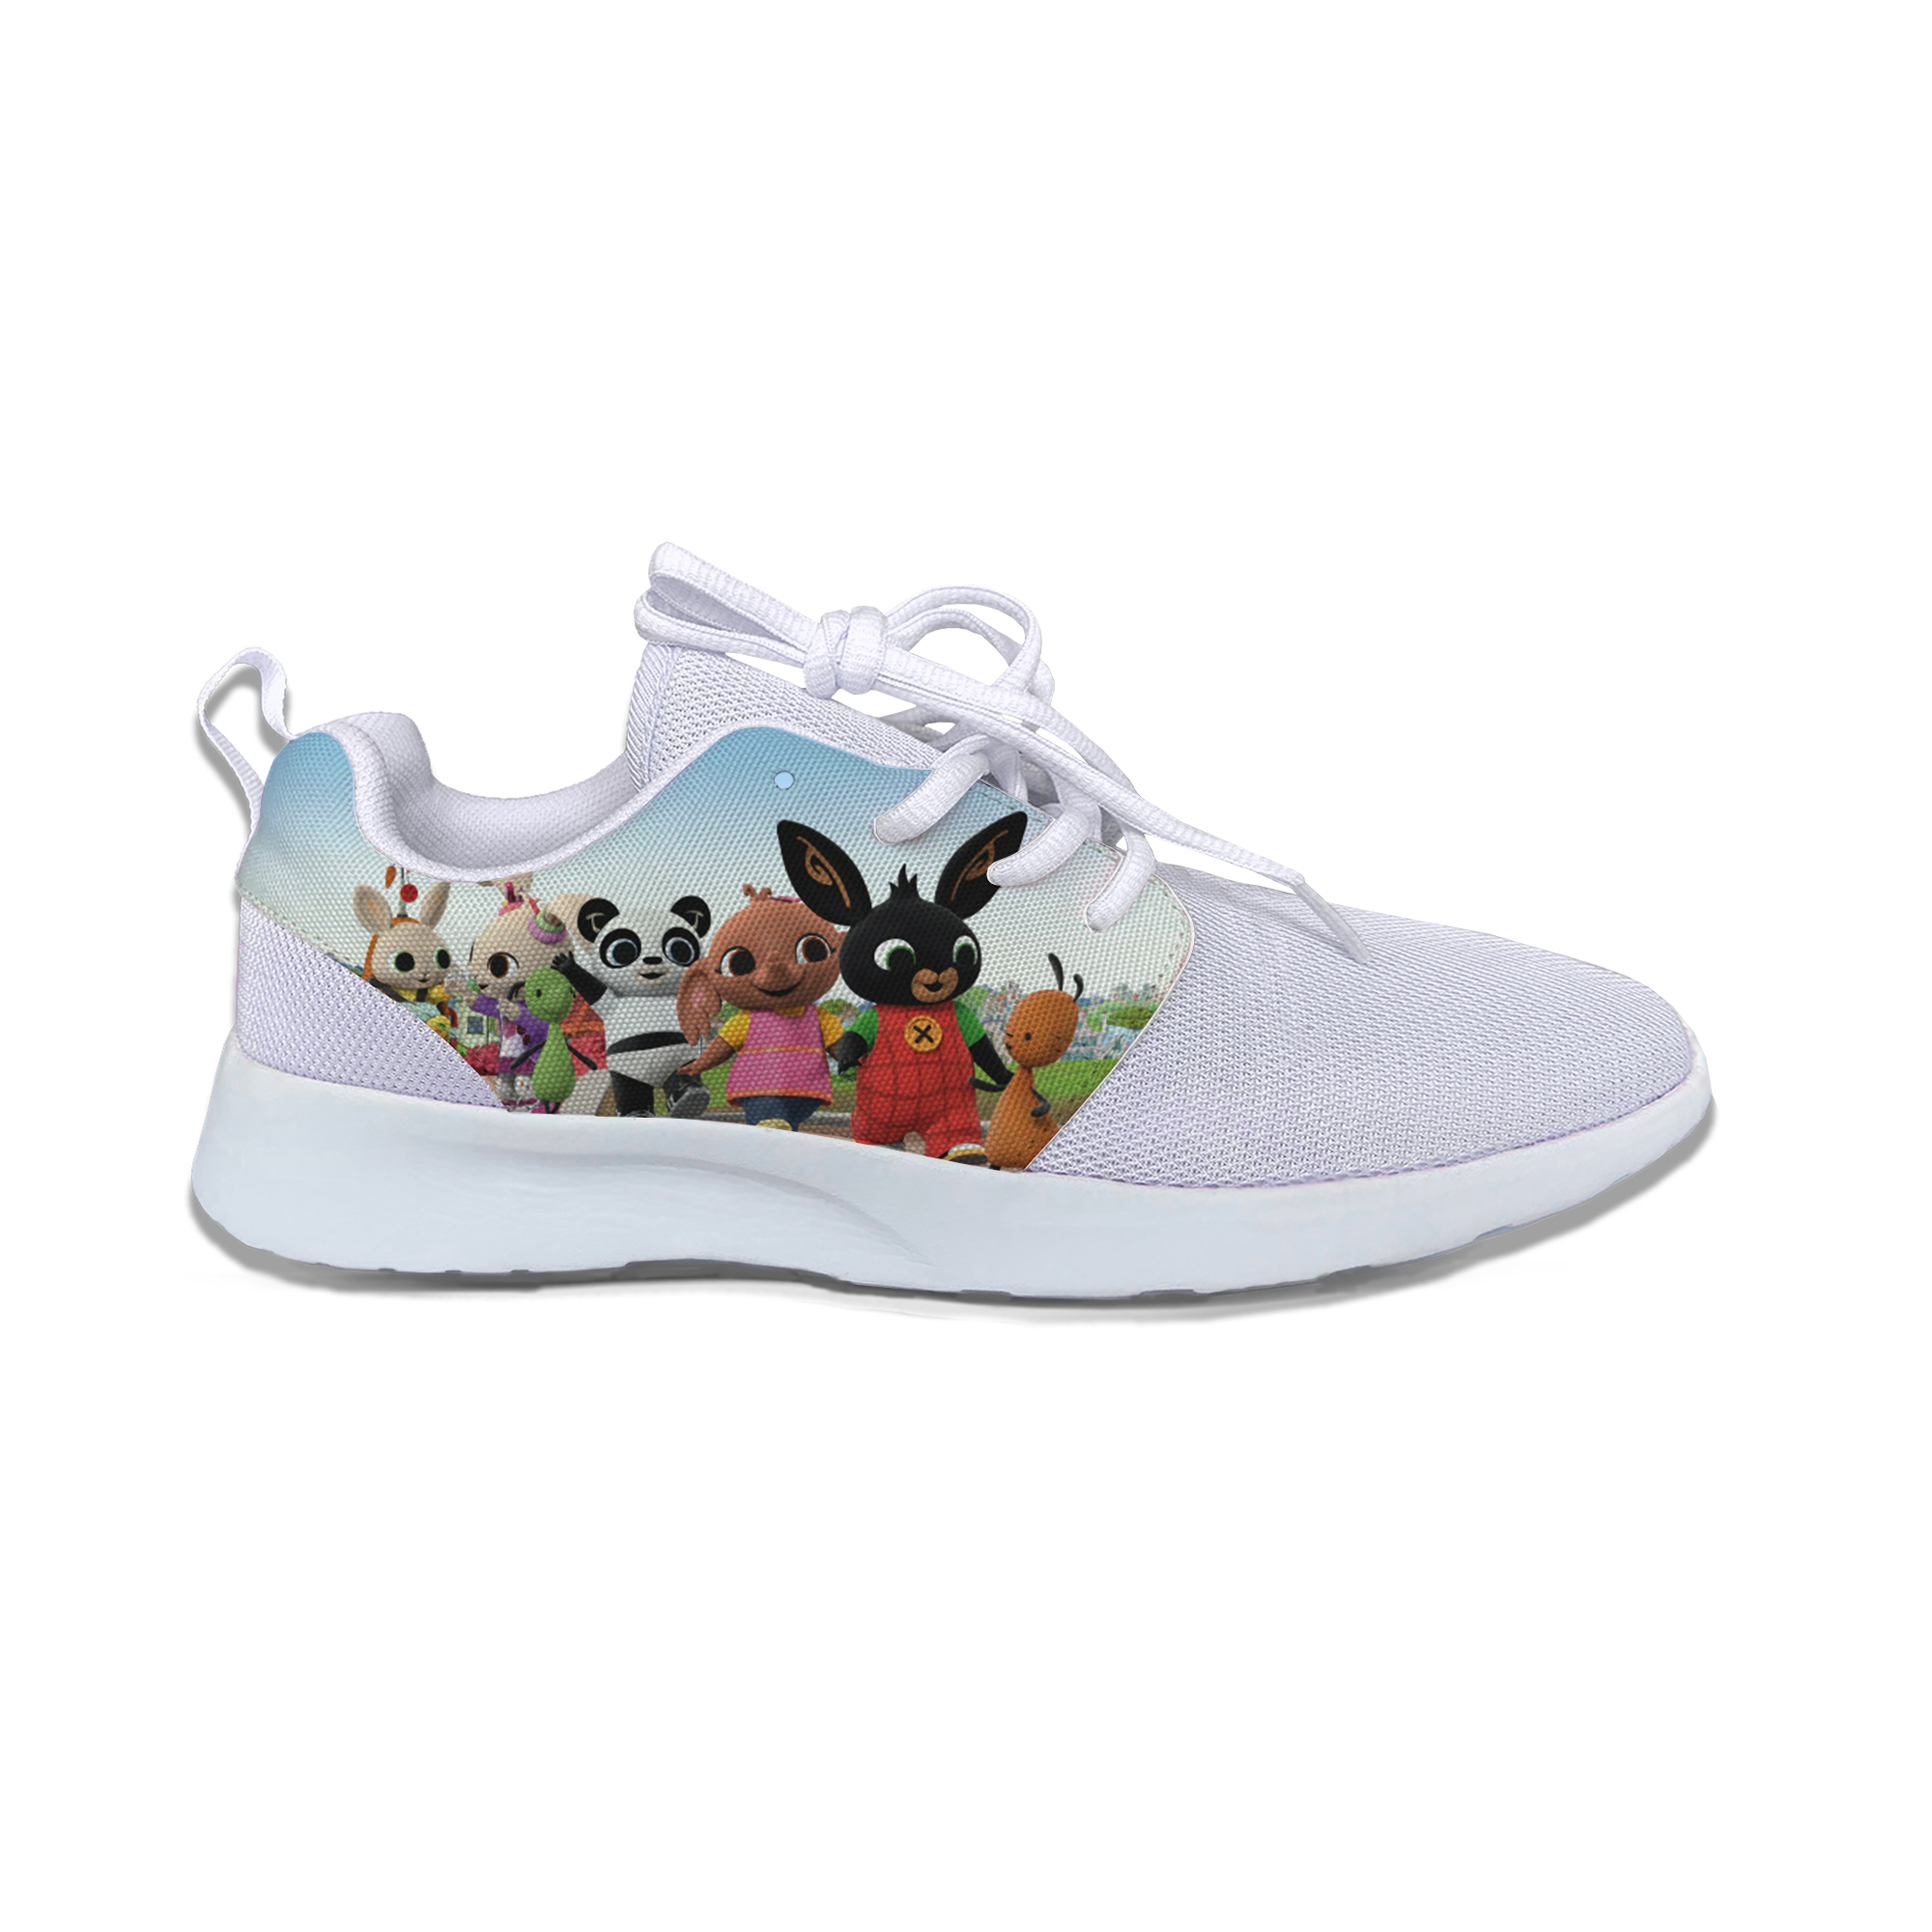 Bing Rabbit Bunny Cartoon Hot Cute Popular Kids Sport Running Shoes Classic Casual Breathable Sneakers Gift Boys Girls Children